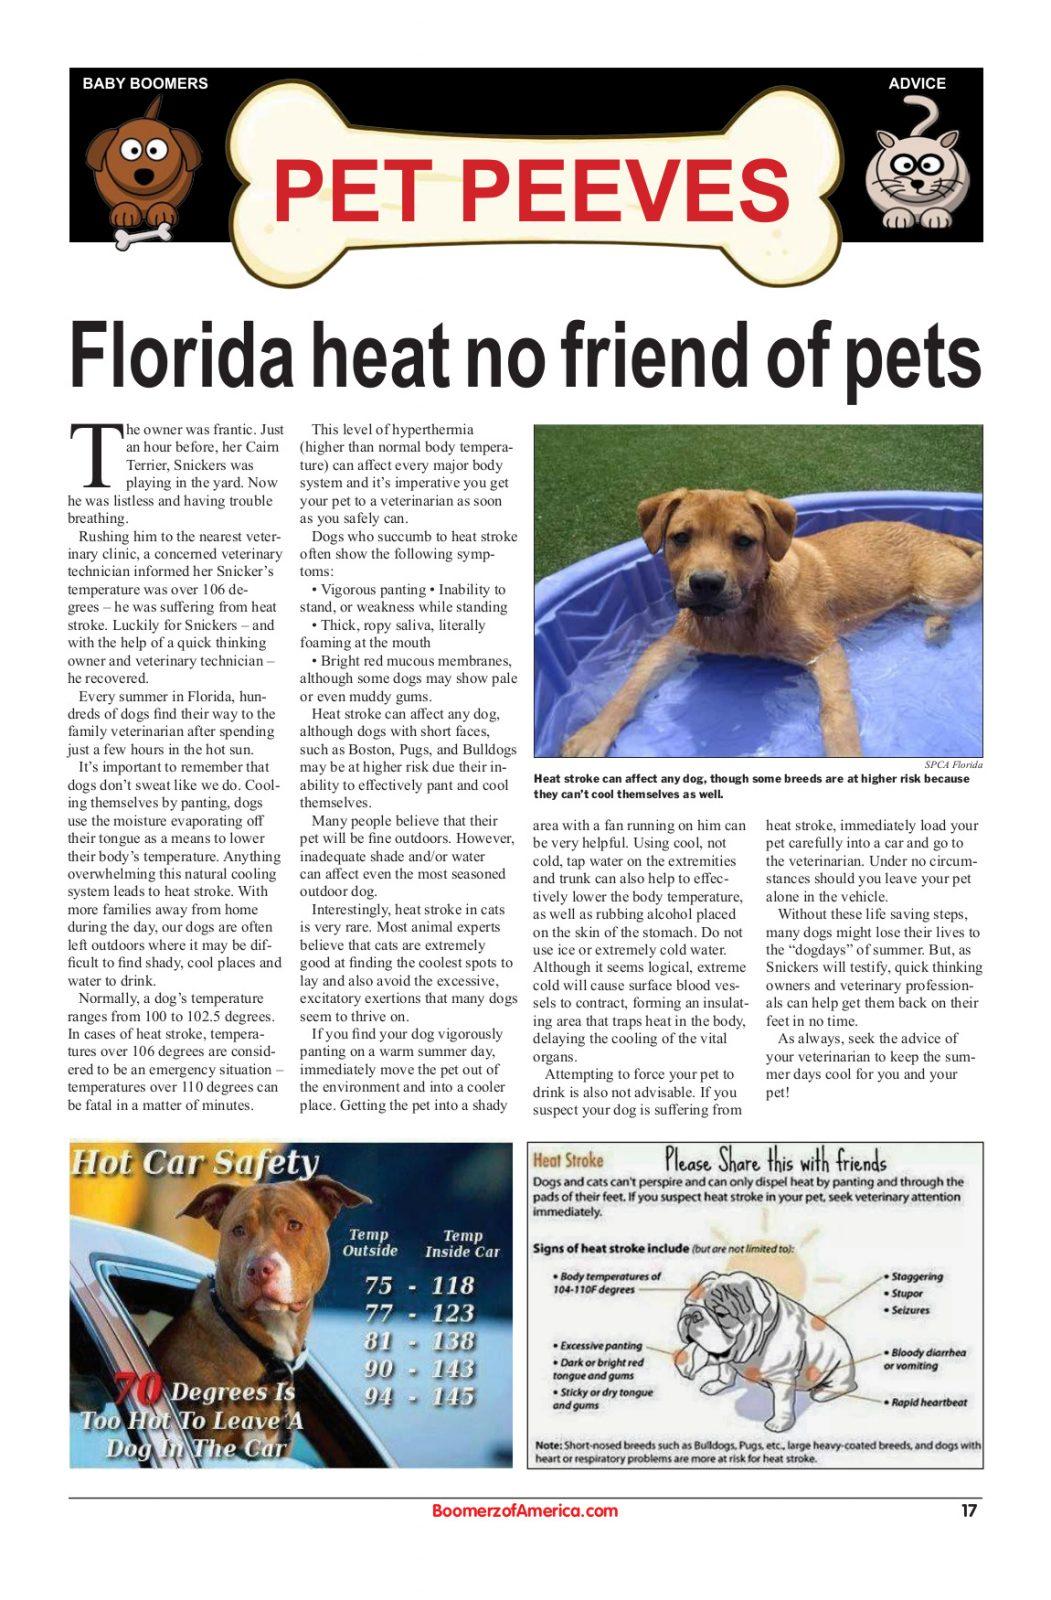 Boomerz Pet Peves Florida Heat No Friend of Pets